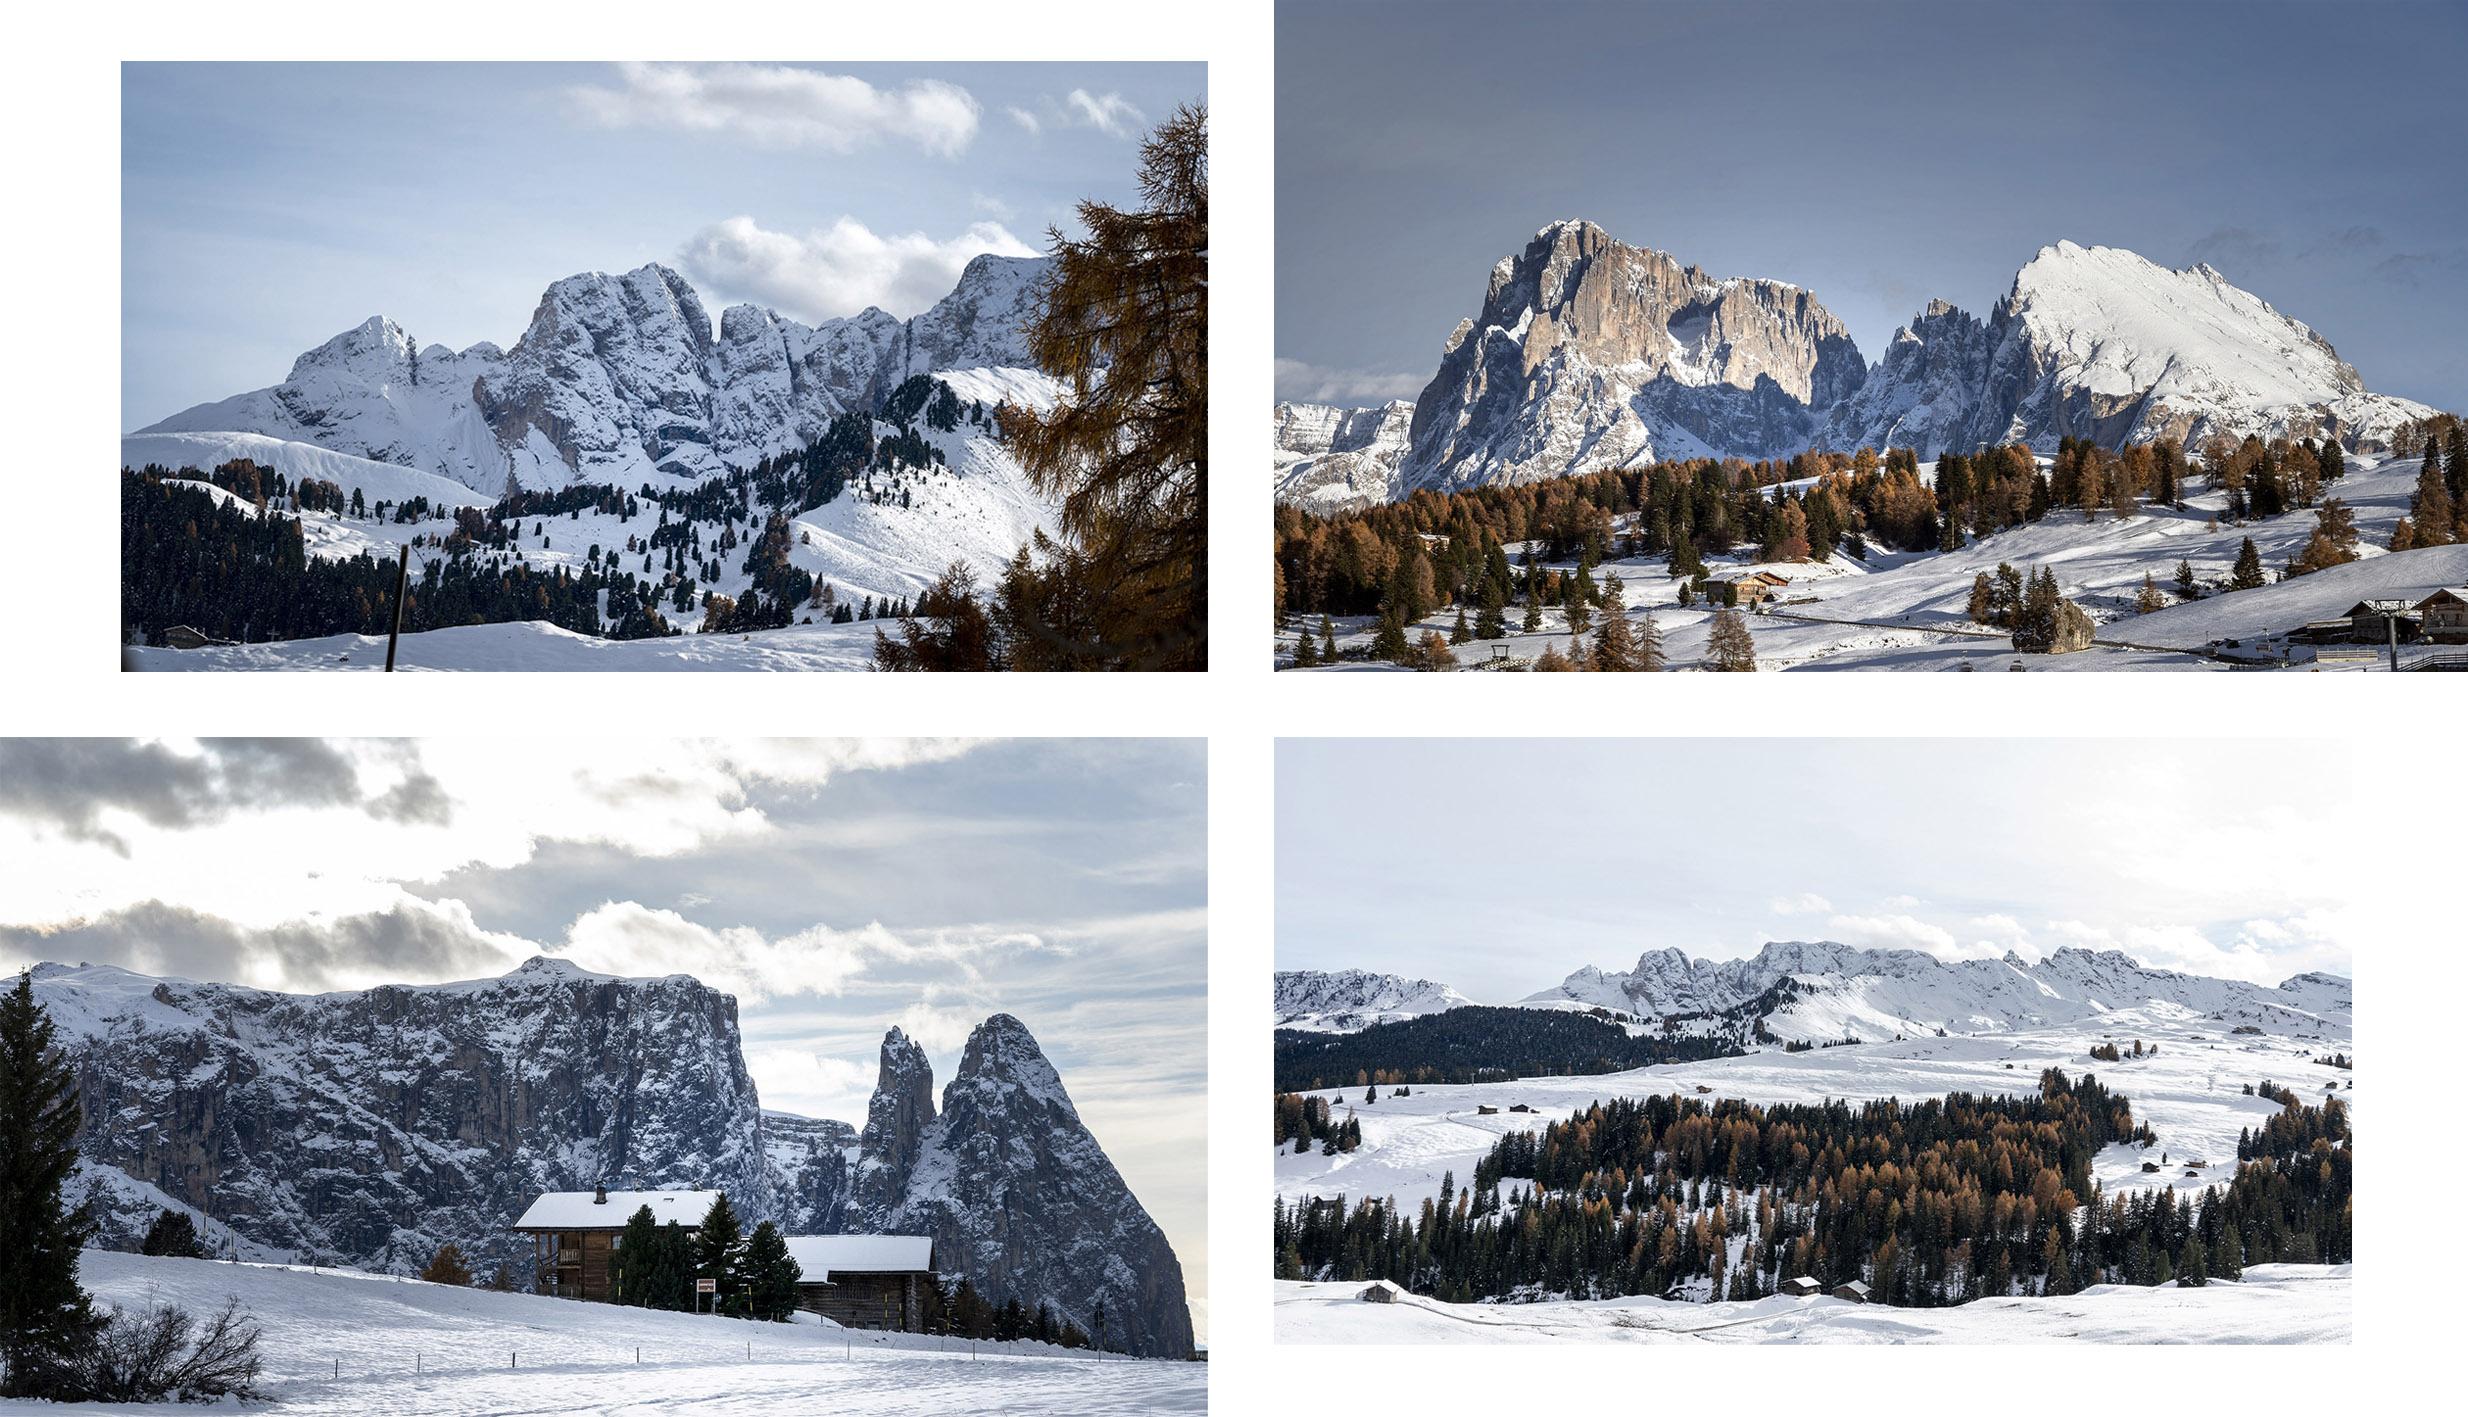 montagnes sud-tyrol Alpe di Siusi neige automne ciel bleu